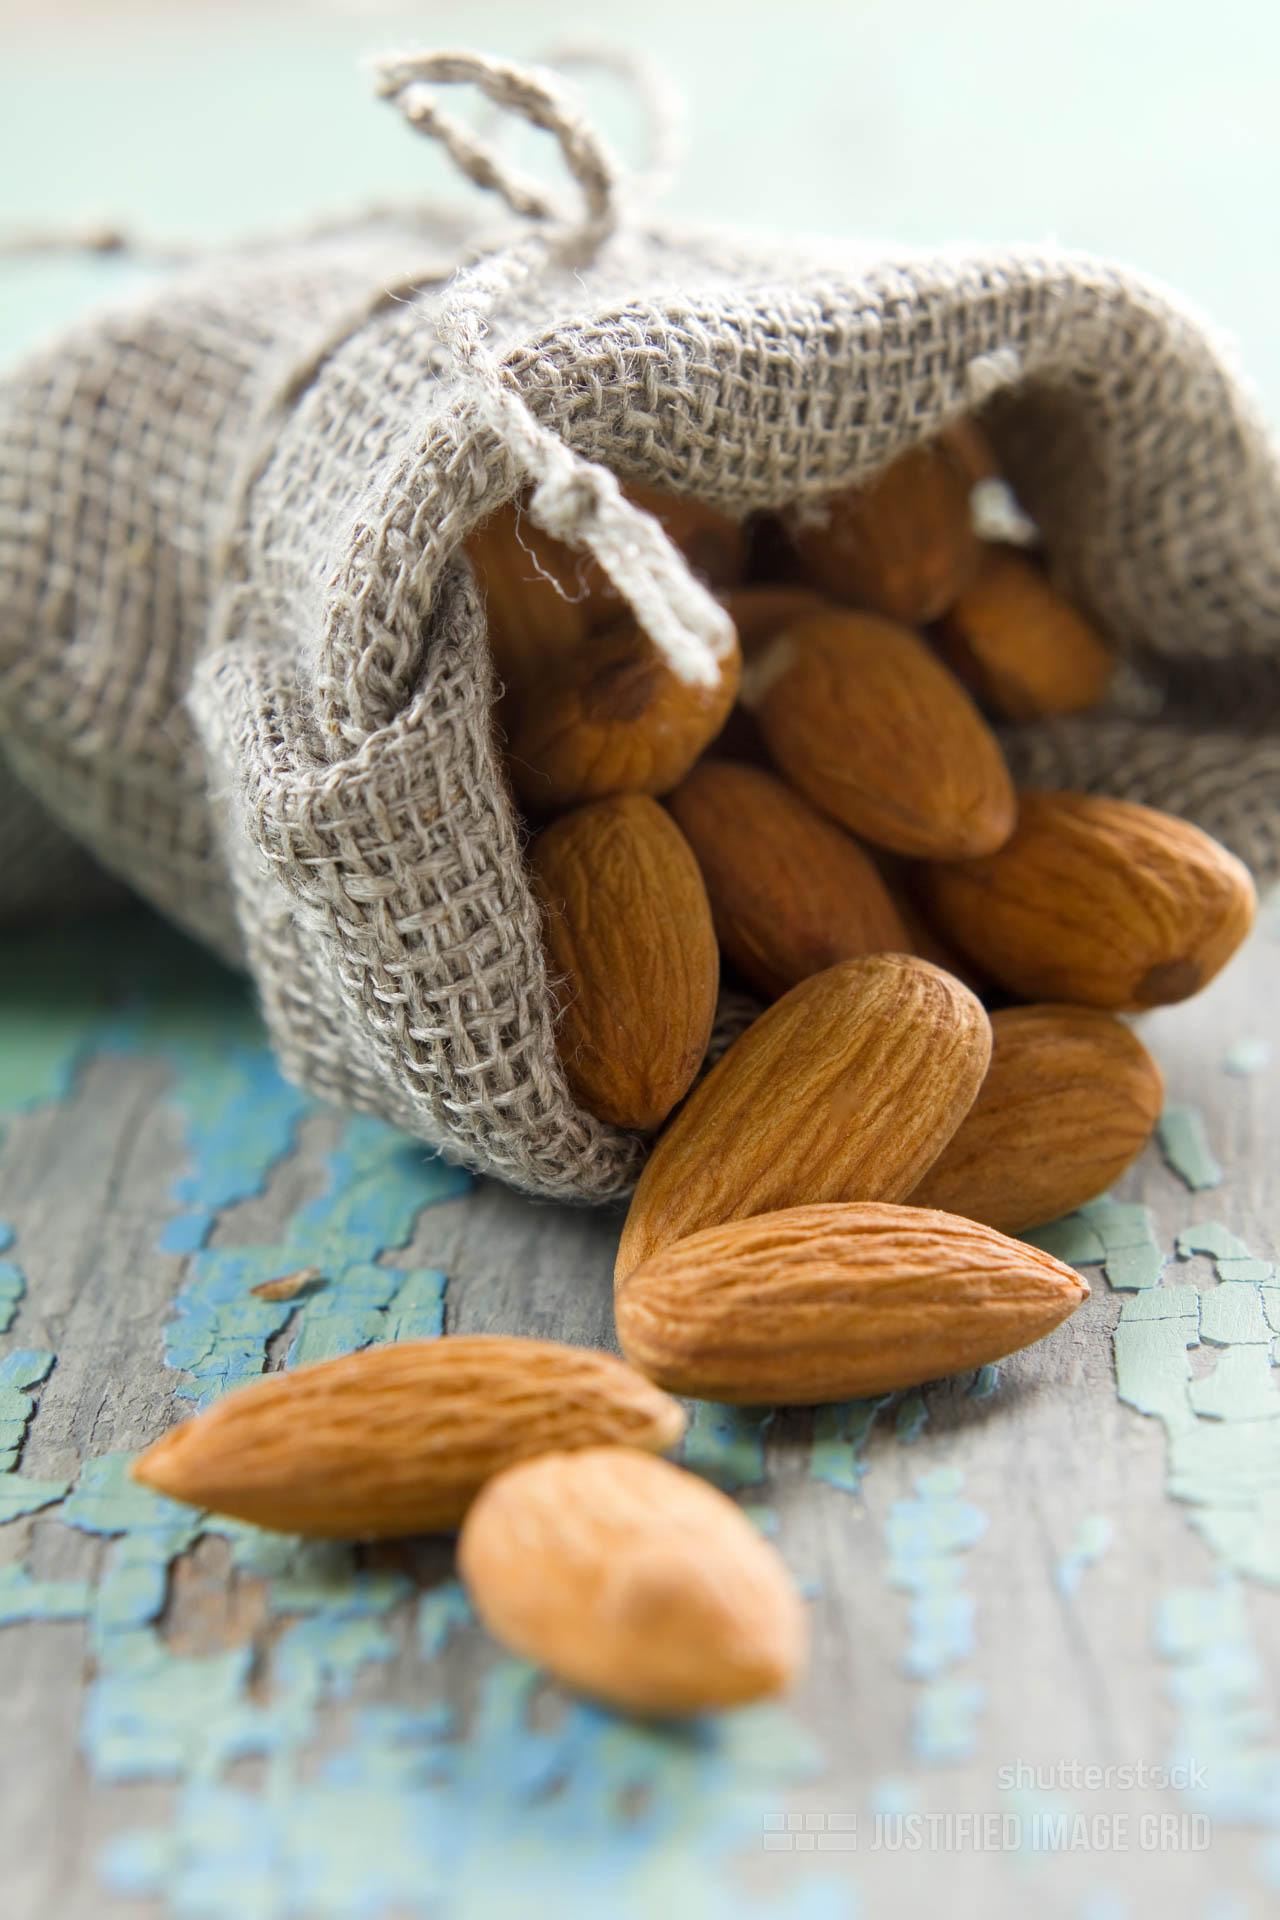 nuts Archives - Justified Image Grid - Premium WordPress Gallery